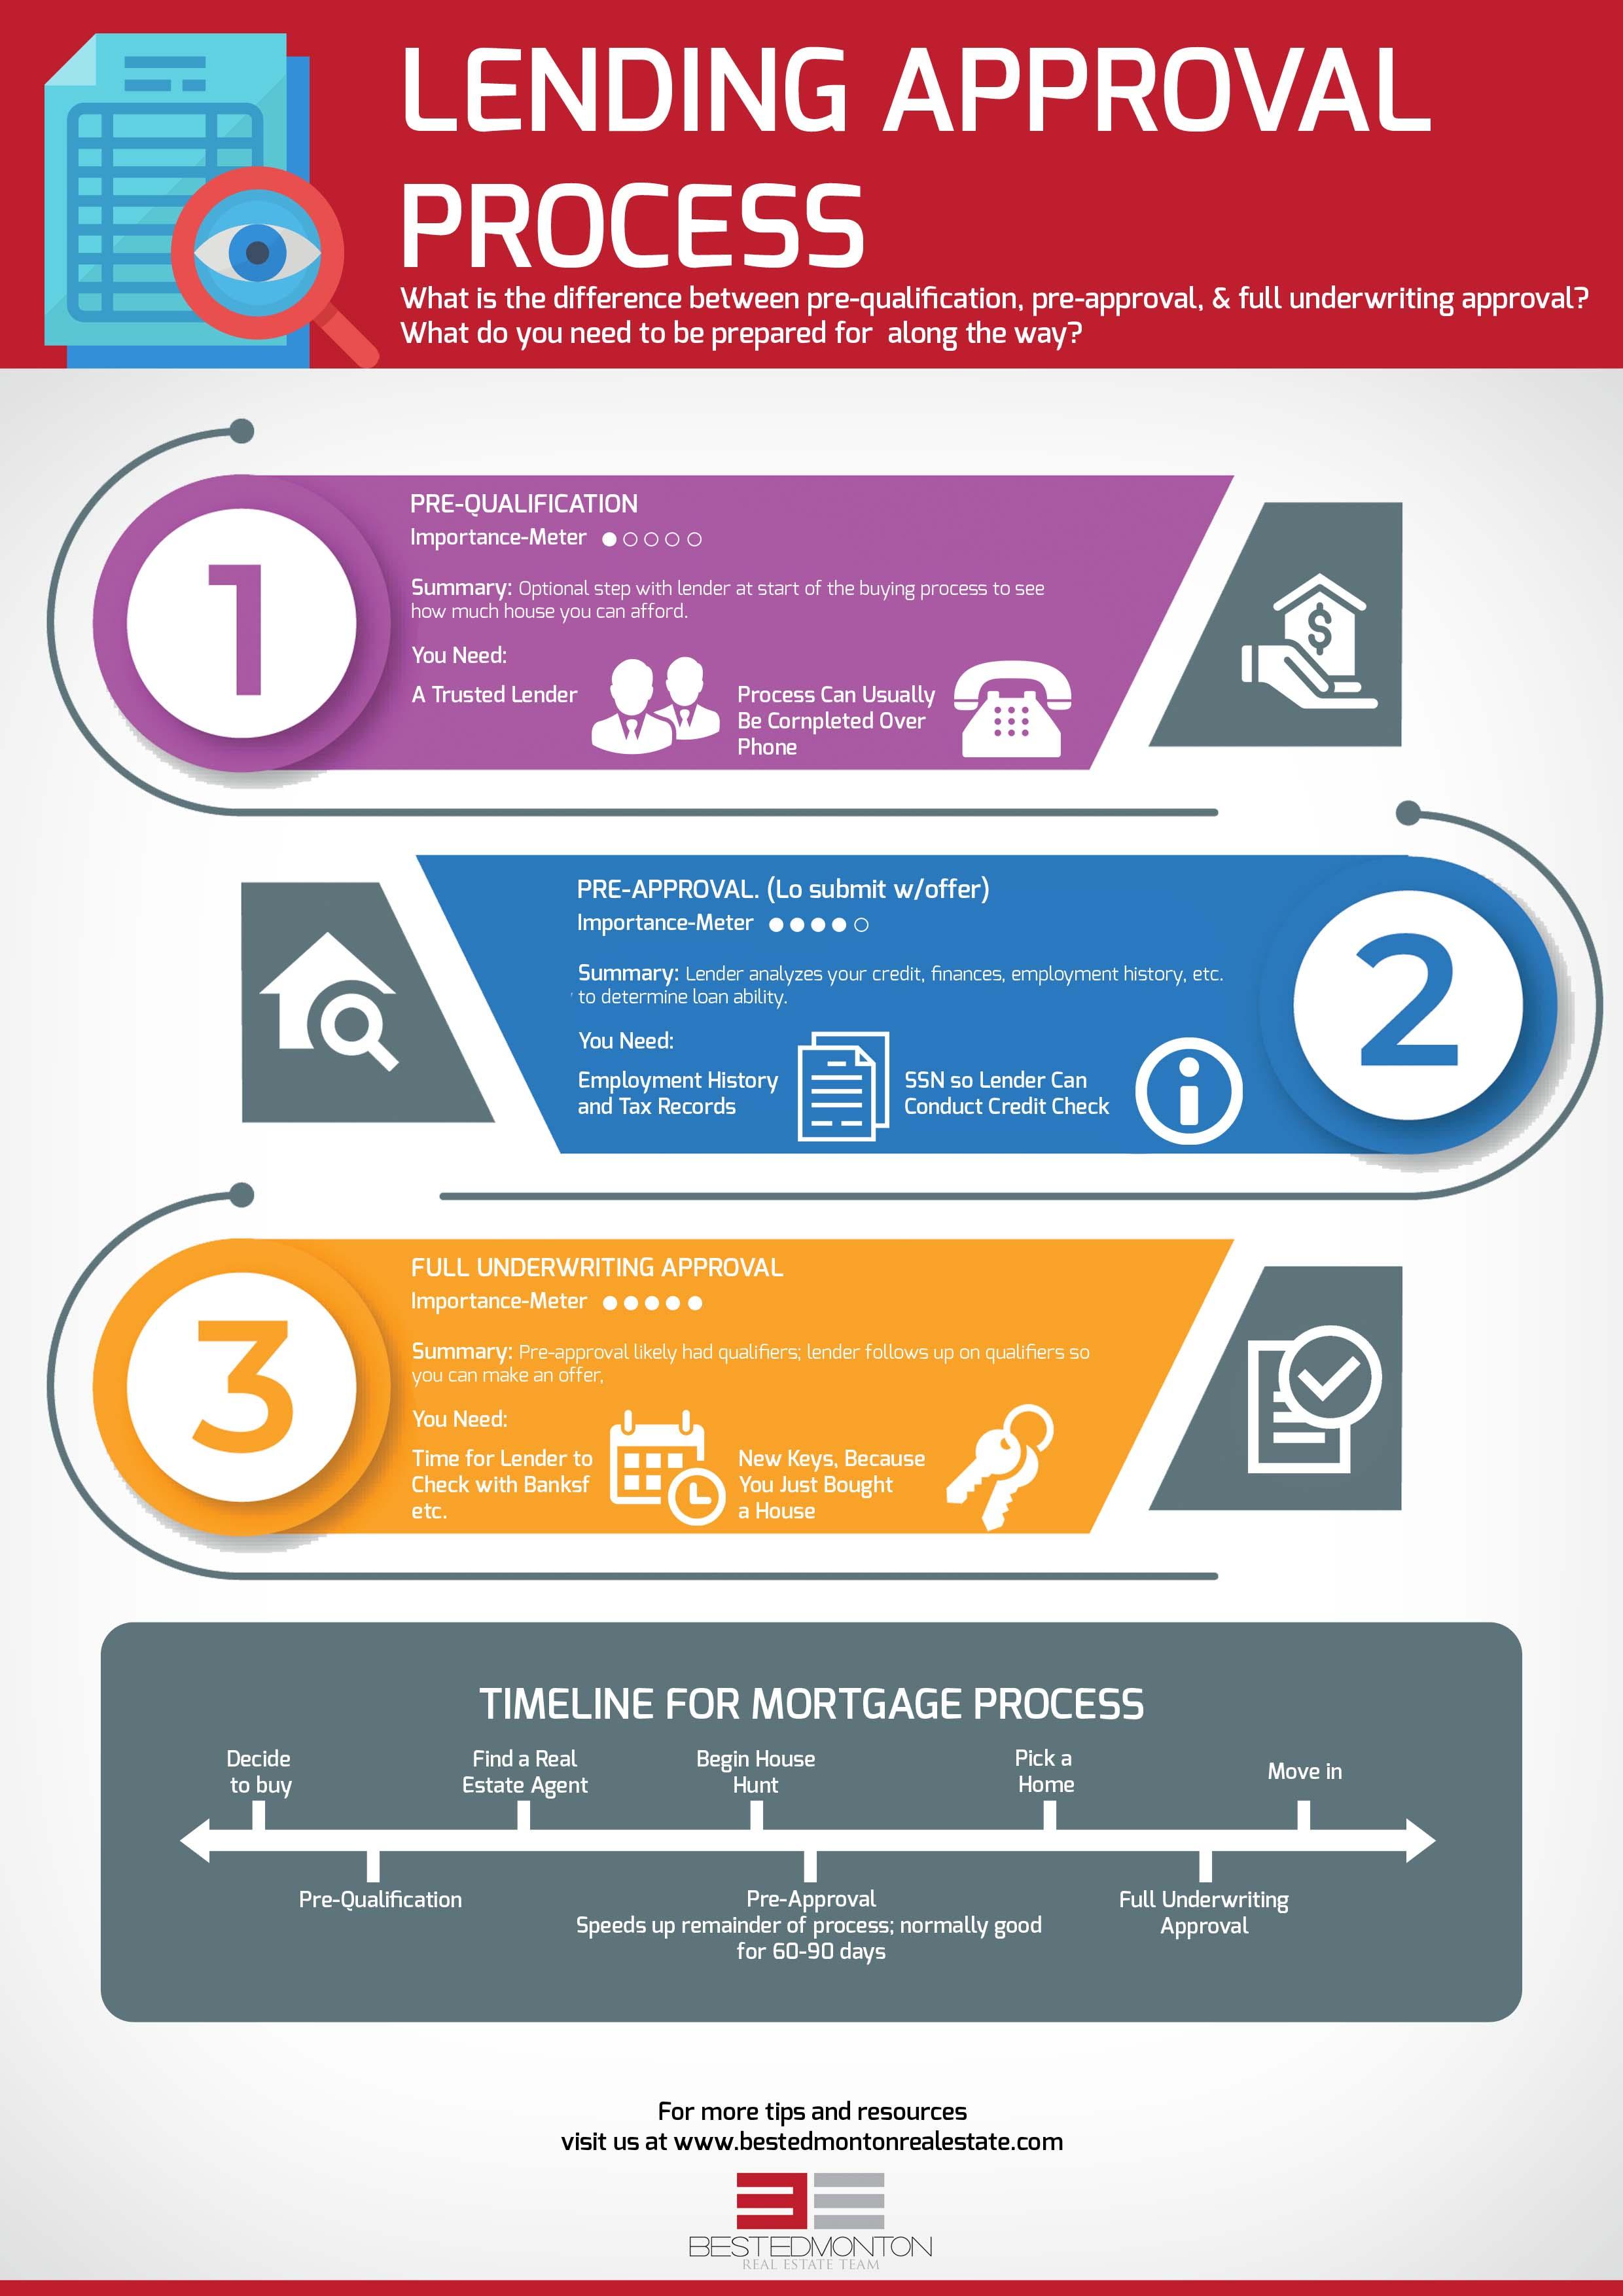 Edmonton Mortgage Approval Process